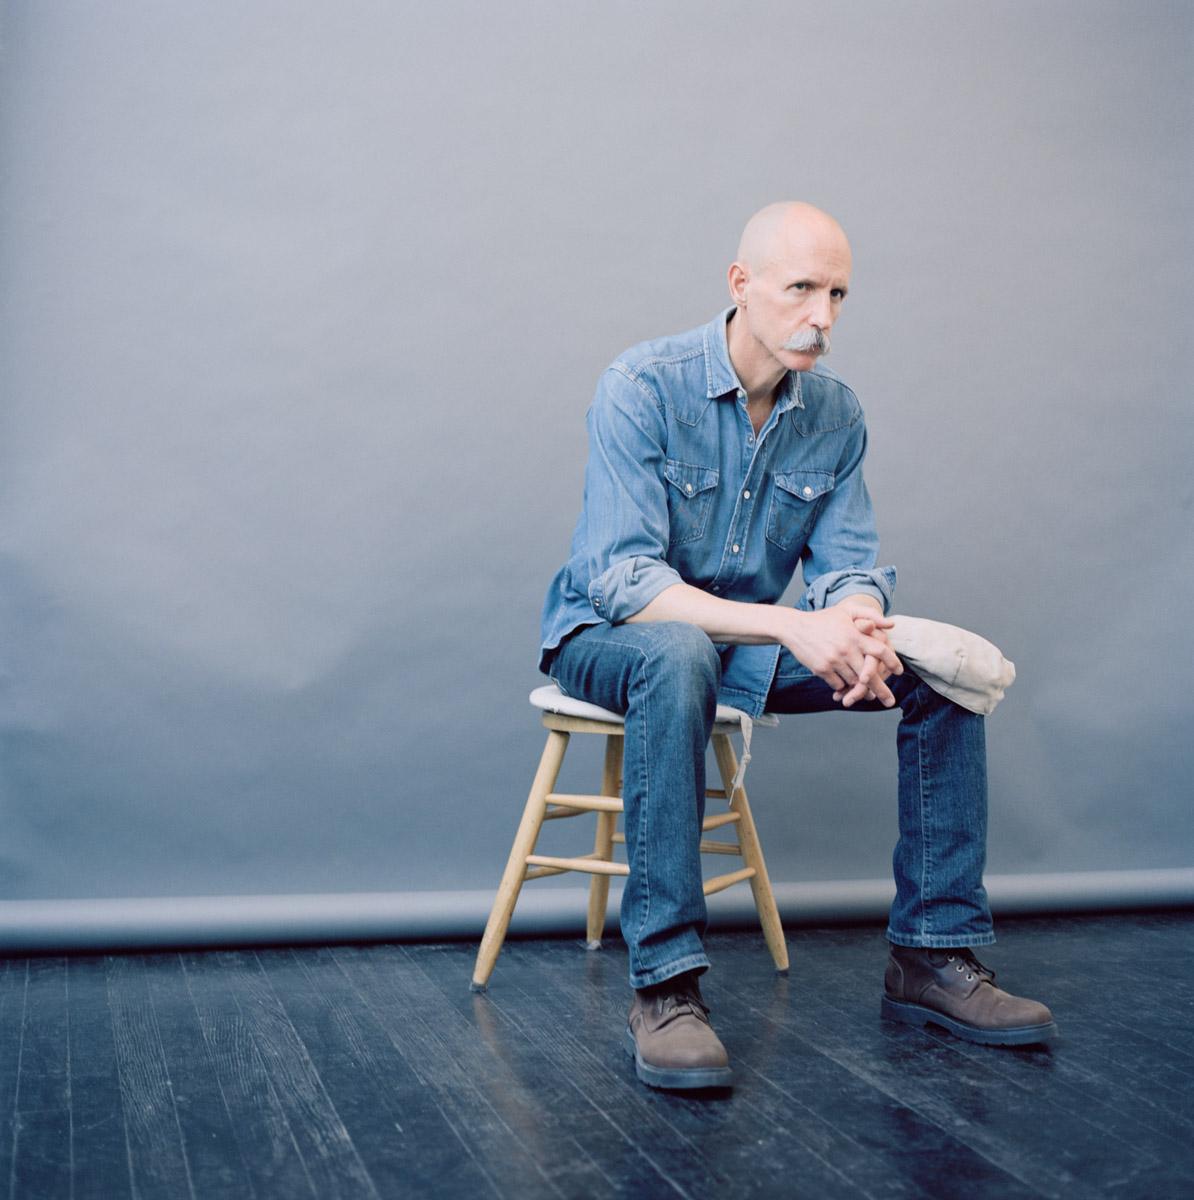 Fashion Photography Dallas Creative Portrait & Fashion Photographer Bald Model